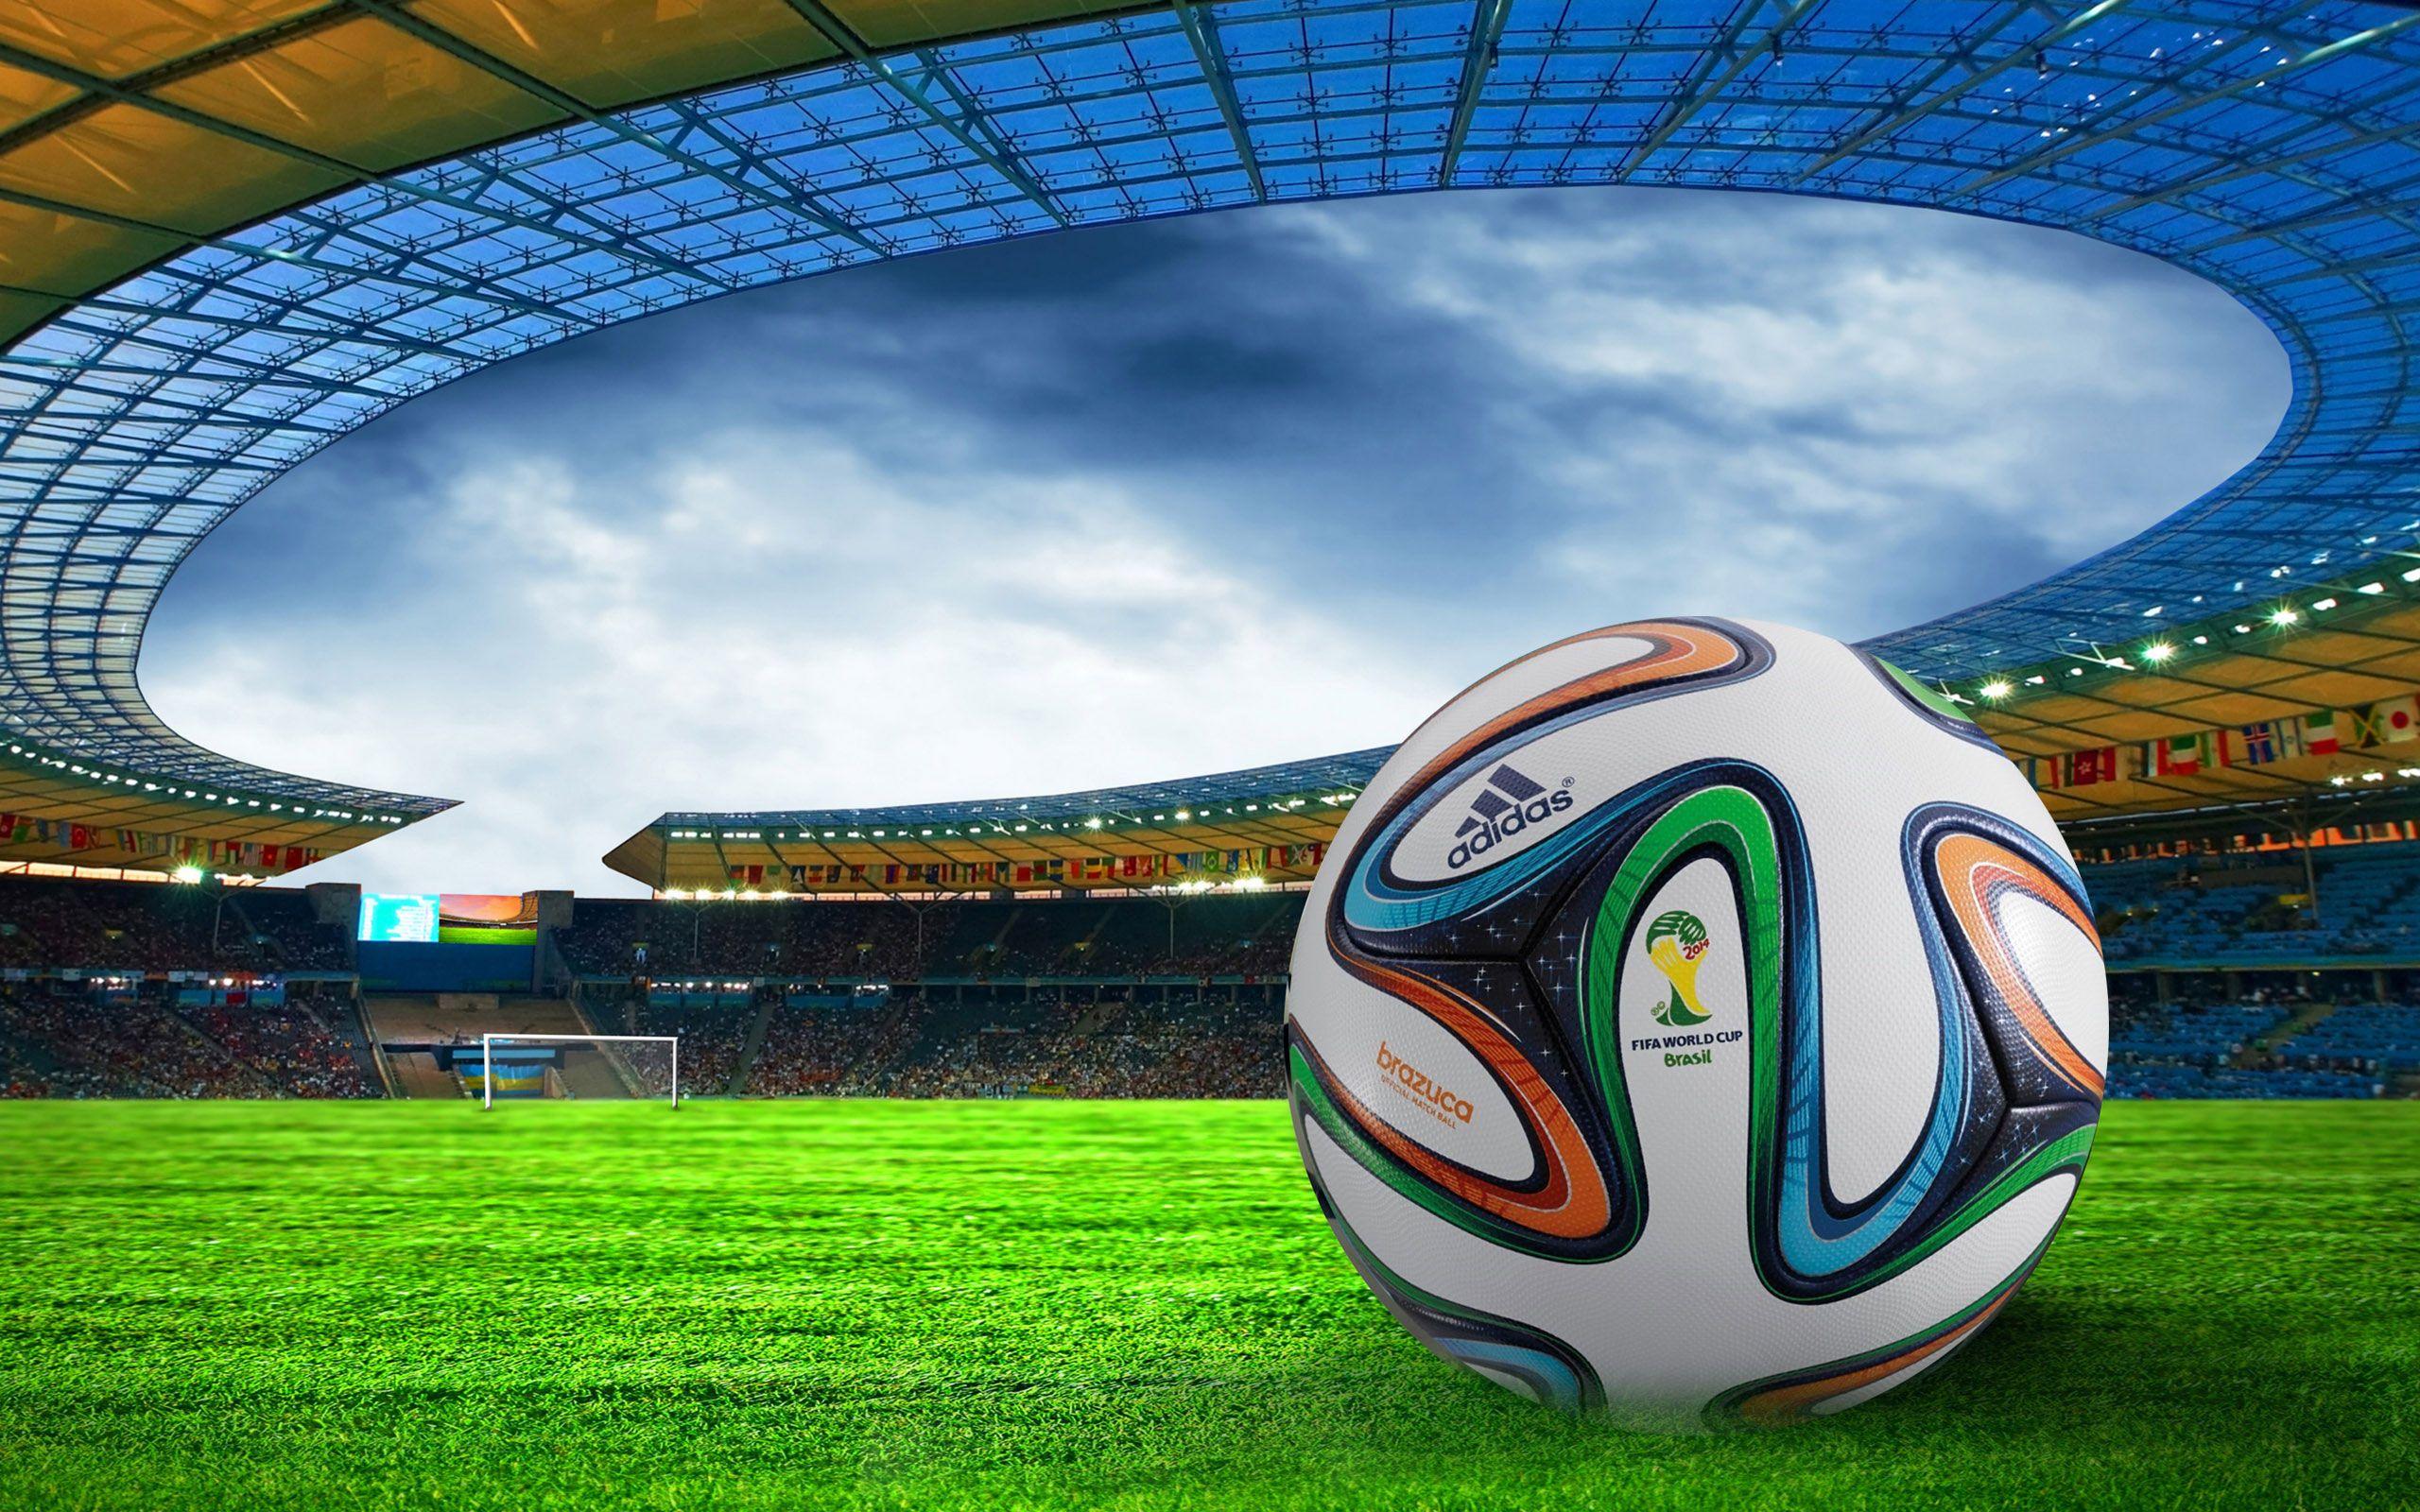 Fifa World Cup Brazil 2014 Hd Desktop Ipad Iphone Wallpapers Fifa World Cup Soccer Fifa